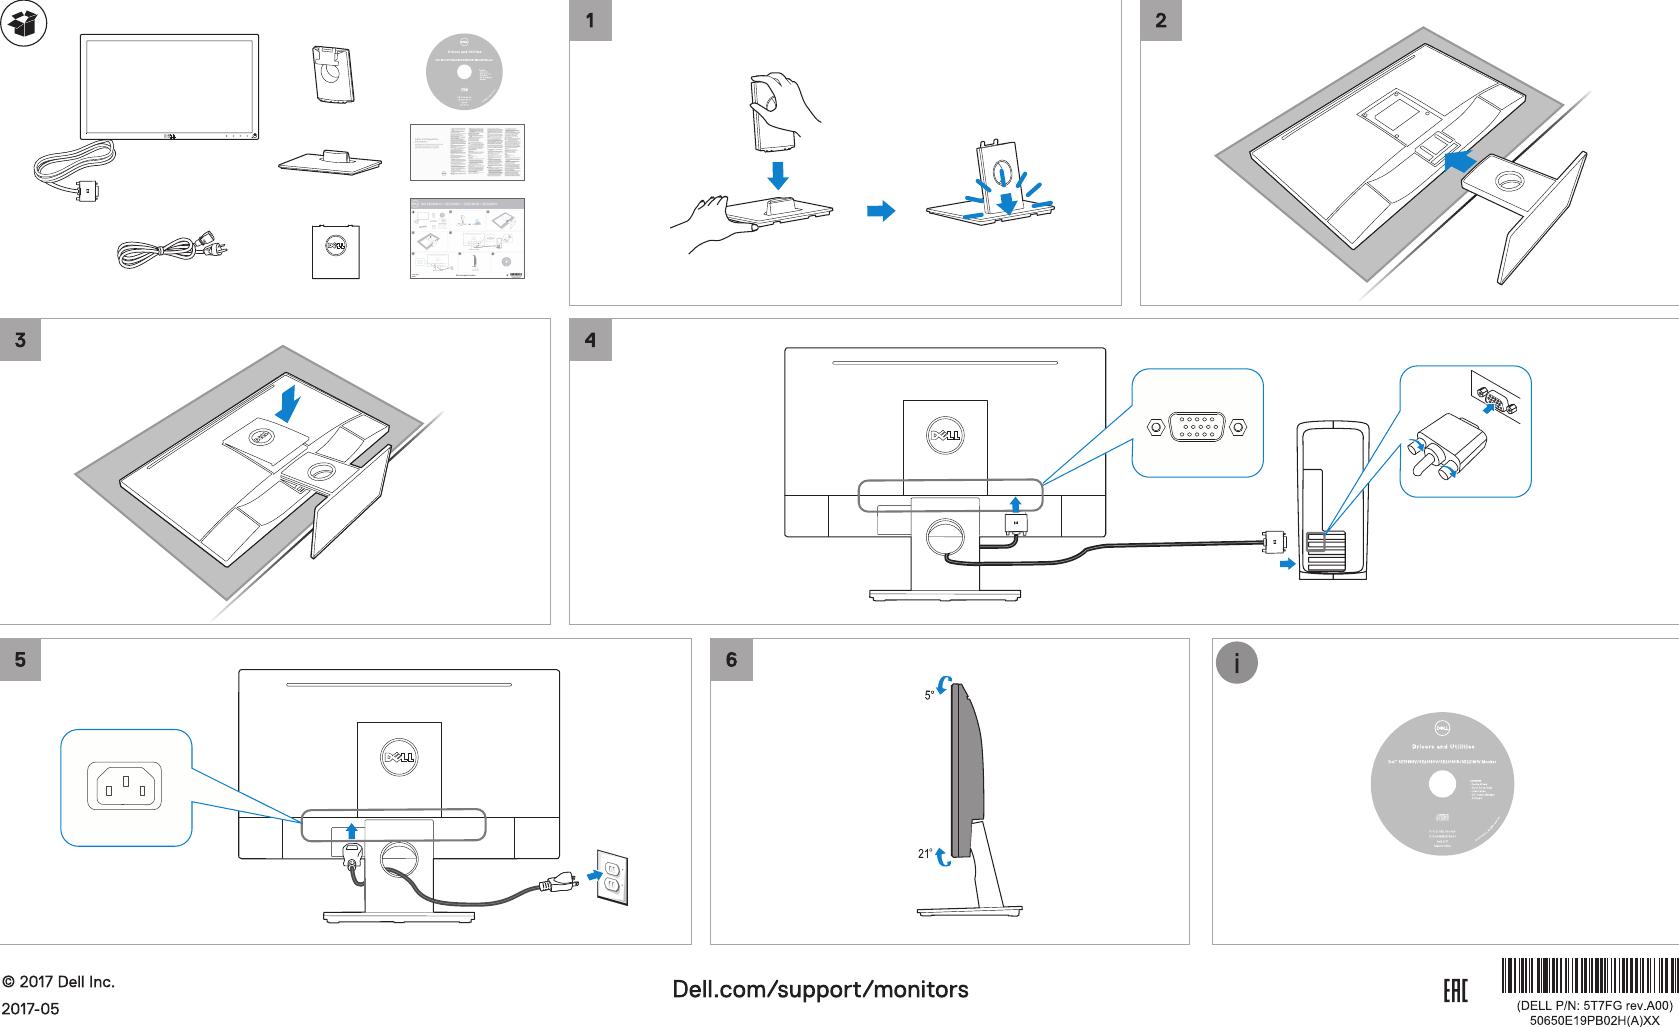 Dell se2018hr monitor 快速入门指南 使用手册 其他文档 Setup Guide Zh cn